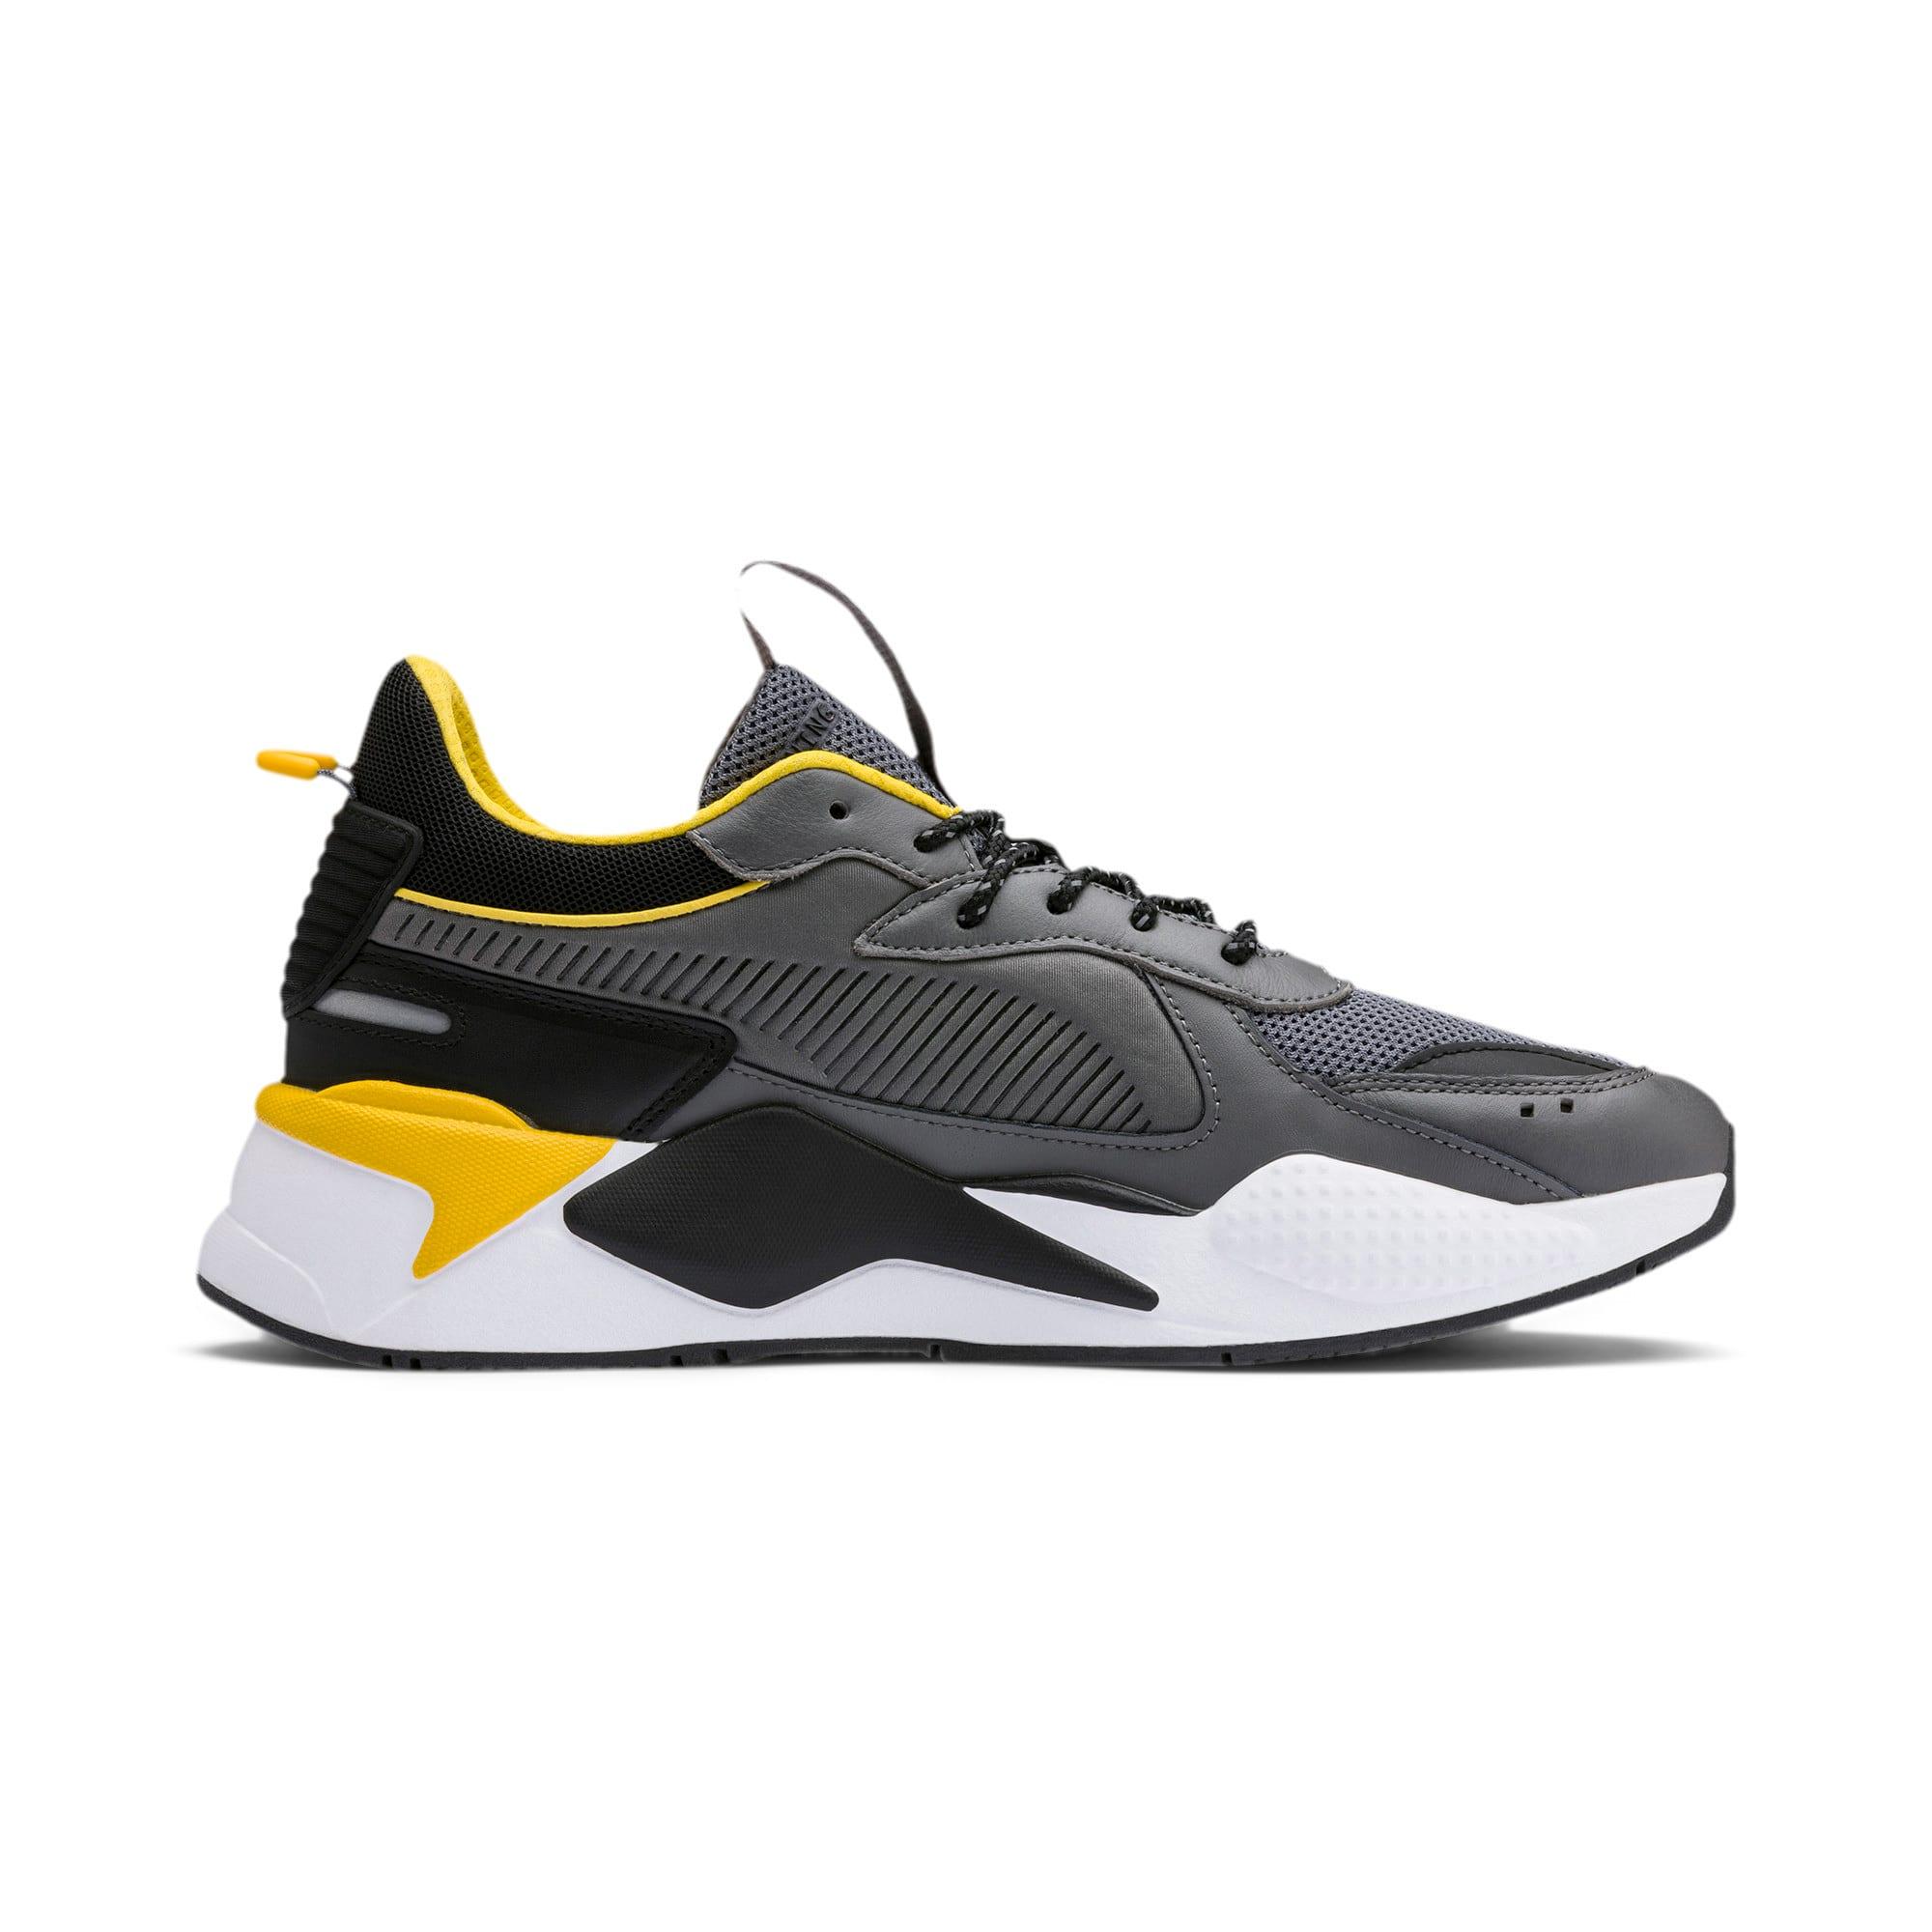 Thumbnail 6 of RS-X Core Sneakers, CASTLEROCK-Puma Black, medium